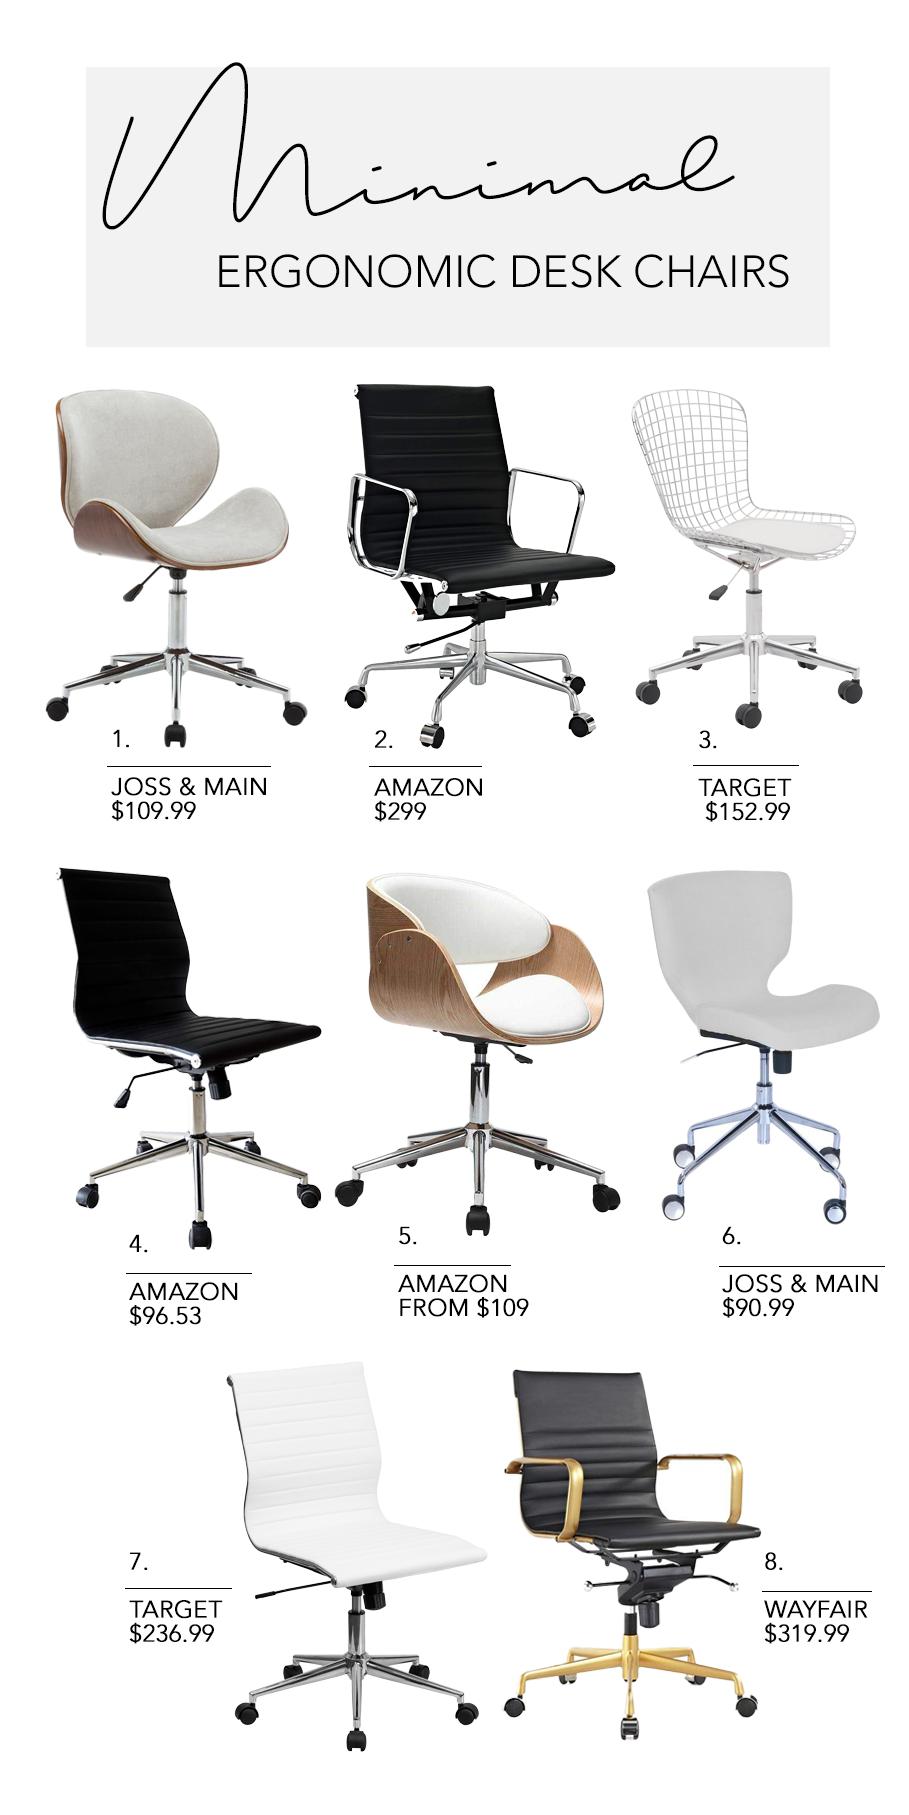 5 Minimalist Home Office Workspace Productivity Boosting Tips Ergonomic Desk Chair Office Desk Chair Ergonomic Desk